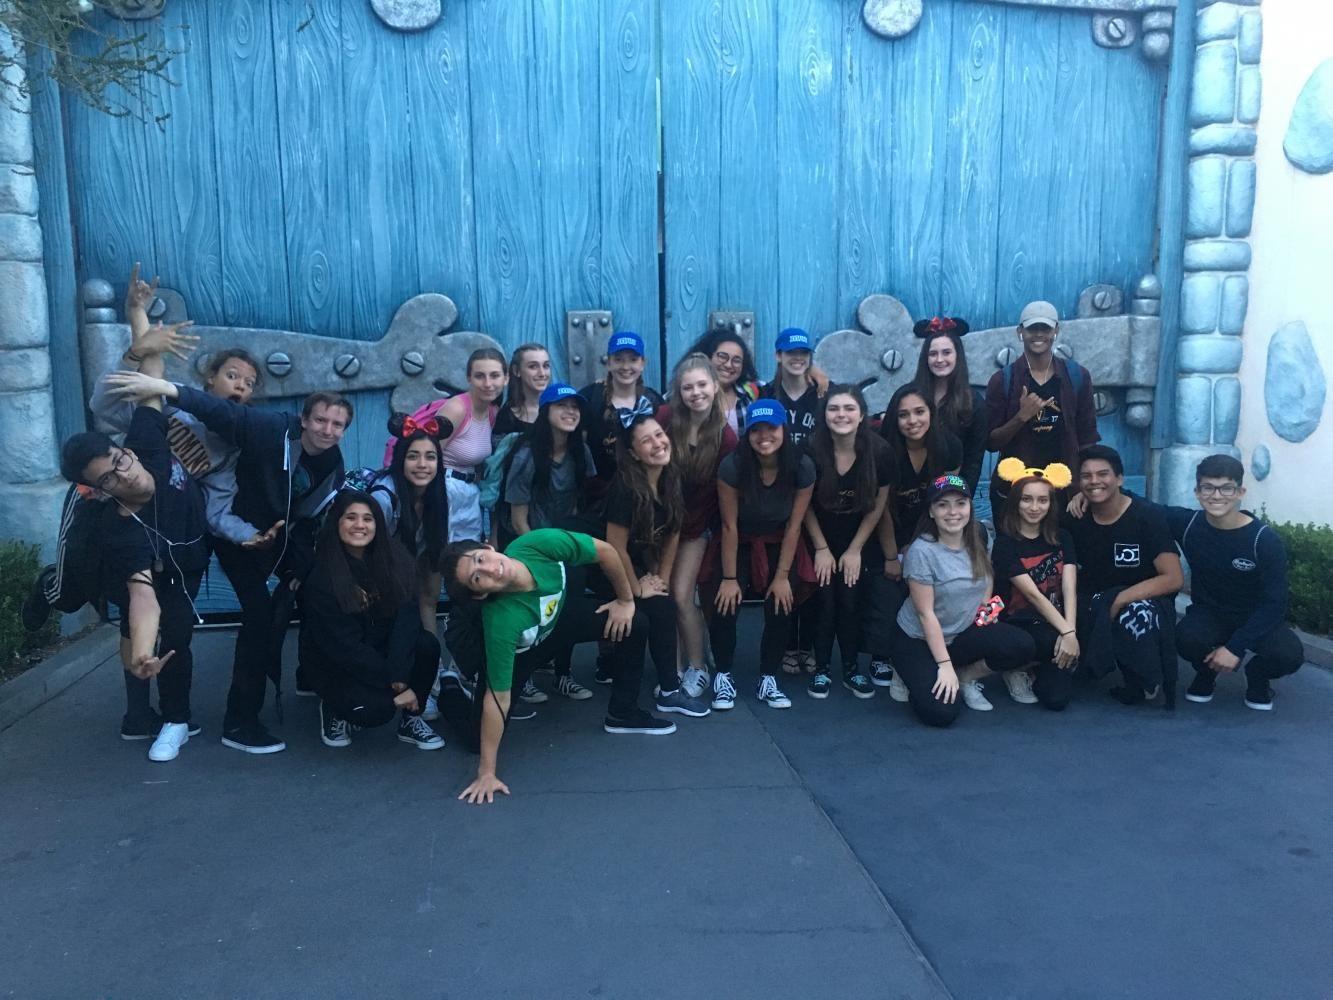 VDC+and+VC+at+Disneyland%3A+%28left+to+right%29+Kyle+P.%2C+Justis+Pearce%2C+Dorian+McHenry%2C+Kayle+Solis%2C+Donna+Gaytan%2C+Francisco+Flores%2C+Julia+Atkinson%2C+Sophia+Pracillio%2C+Hayley+Hoey%2C+Mia+Vasquez%2C+Megan+Formancowiz%2C+Avery+Miles%2C+Kaylee+Nguyen%2C+Isabella+Perez%2C+Vanessa+Carroll%2C+Lilia+Bour%2C+Kate+Ayala%2C+Alyssa+Farnsworth%2C+Ashley+Ramynke%2C+Stela+Martinez%2C+Christian+Bernard%2C+Israel+Rios%2C+and+Troy+Nishimoto.